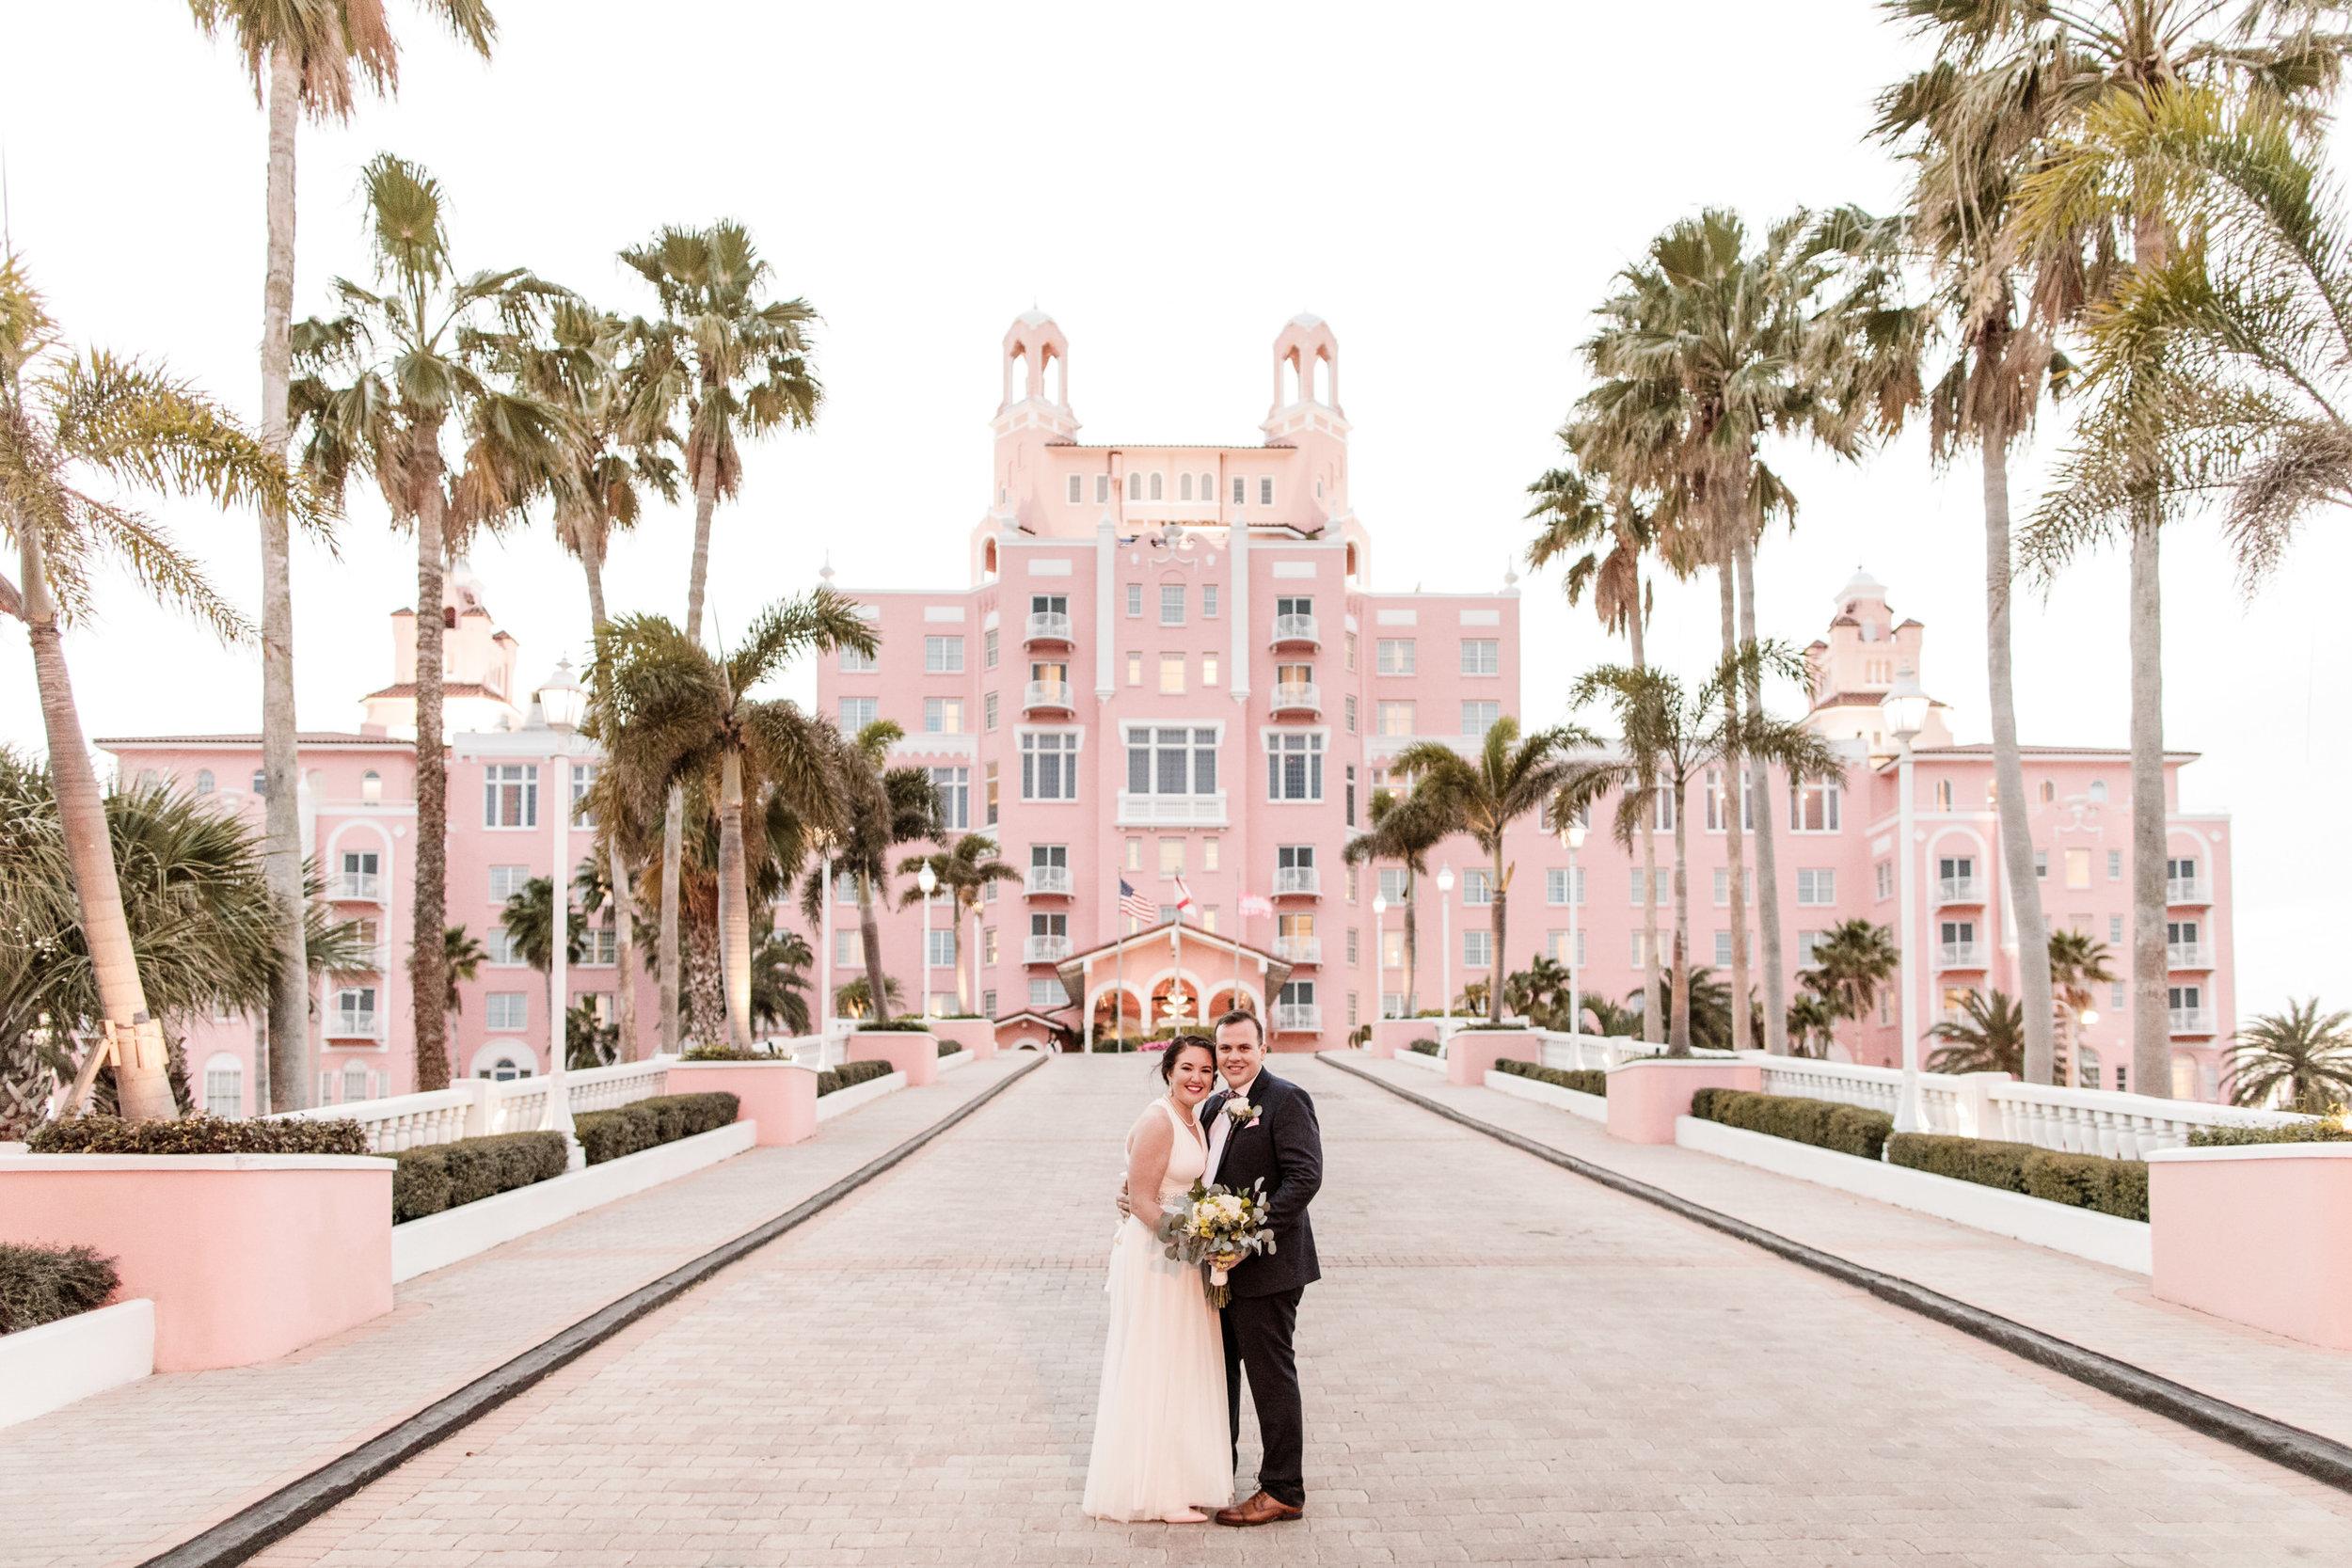 Beltran_Treasure_Island_Elopement_Tampa_Wedding_146-1.jpg